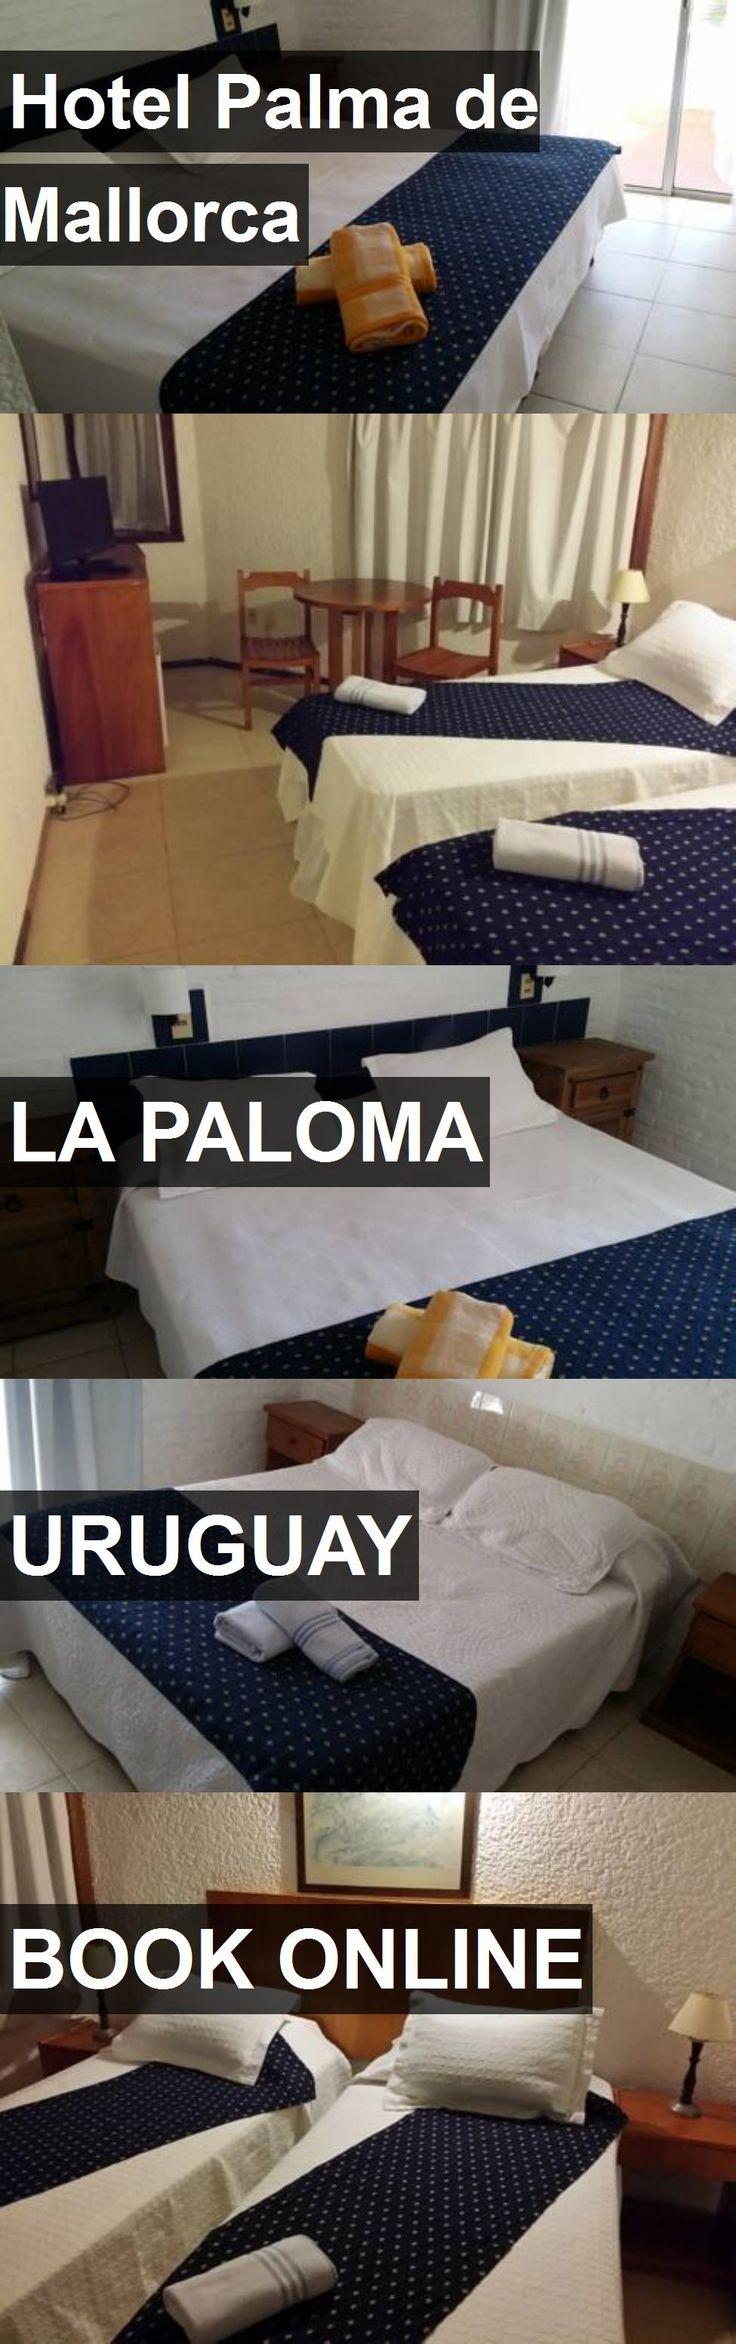 Hotel Hotel Palma de Mallorca in La Paloma, Uruguay. For more information, photos, reviews and best prices please follow the link. #Uruguay #LaPaloma #HotelPalmadeMallorca #hotel #travel #vacation